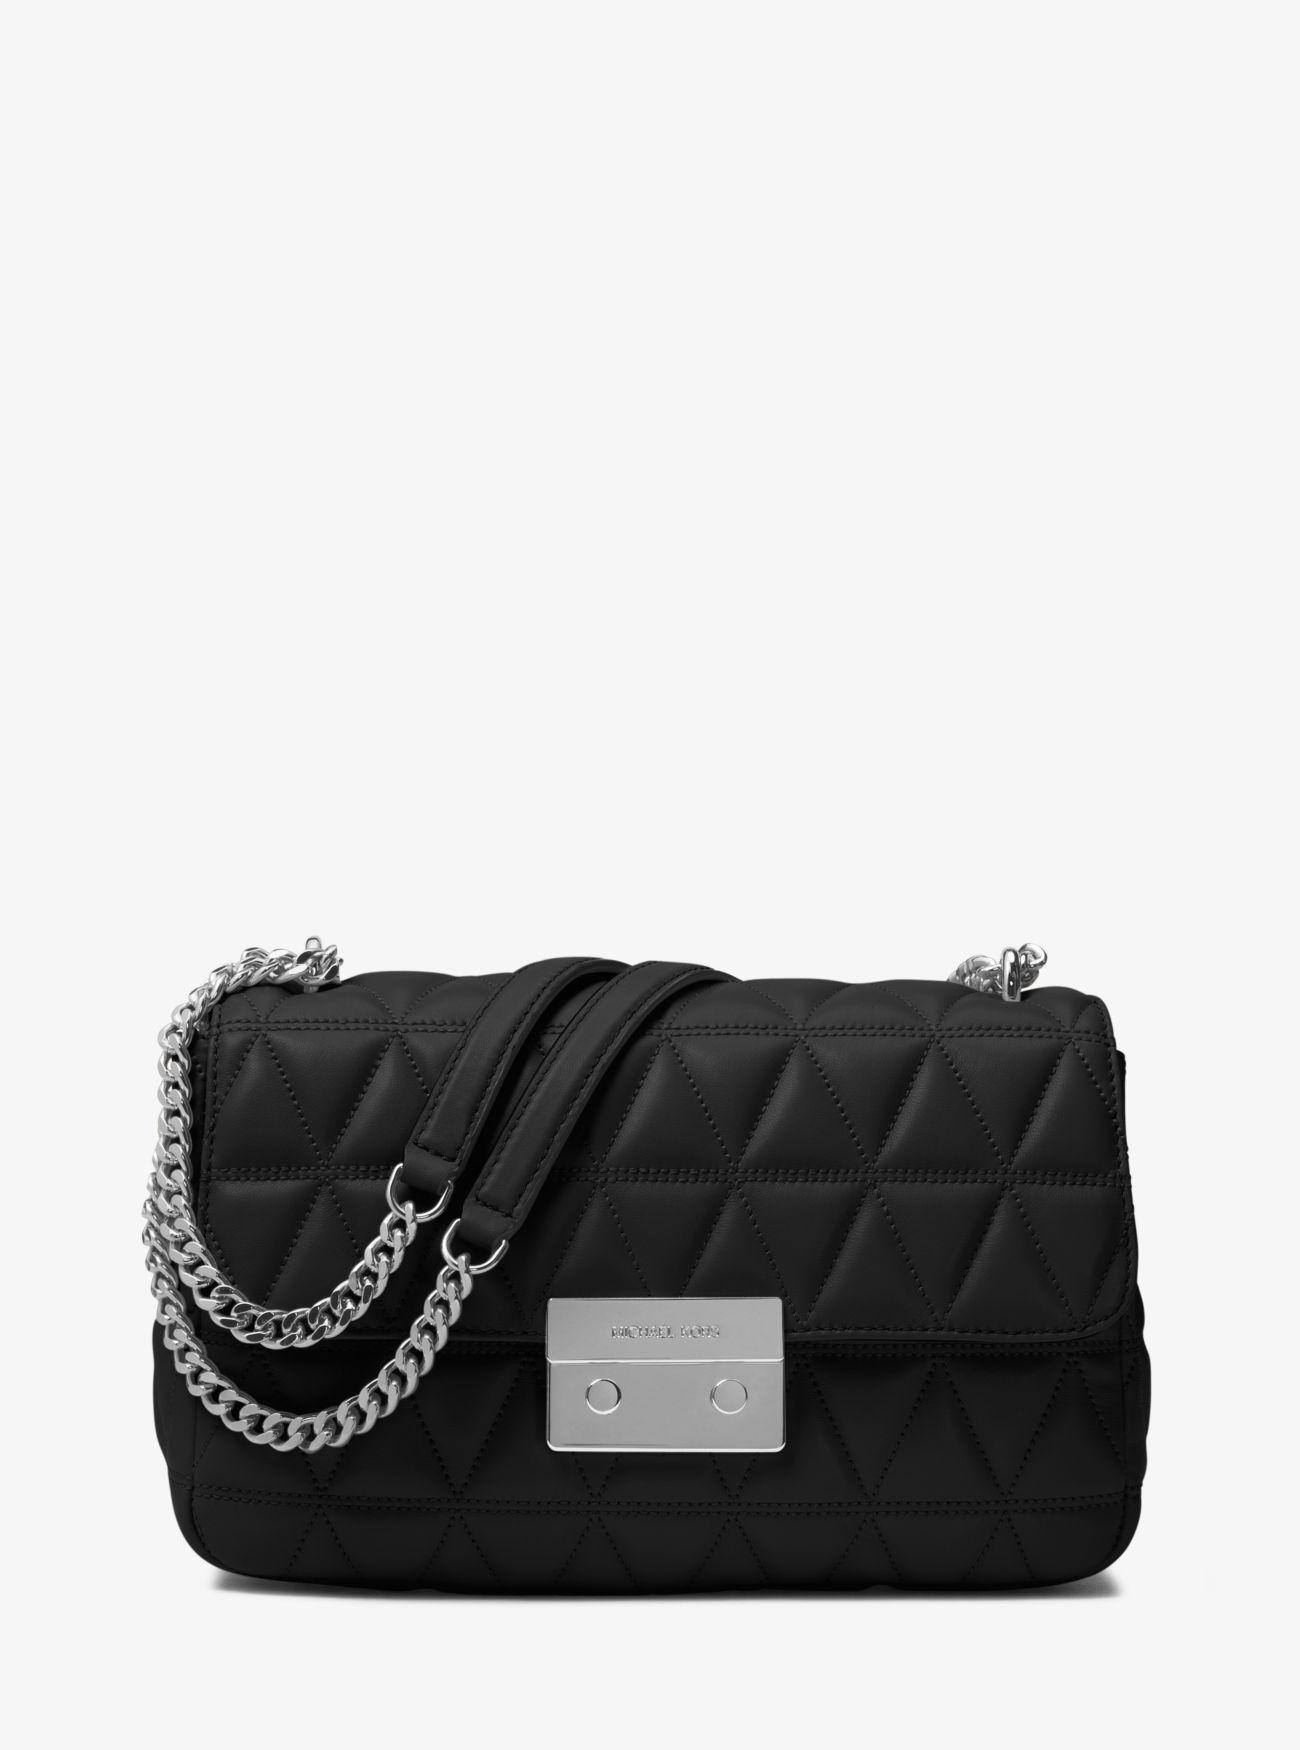 cc0e4a1e90a7 Michael Kors Sloan Large Quilted-Leather Shoulder Bag - Black ...